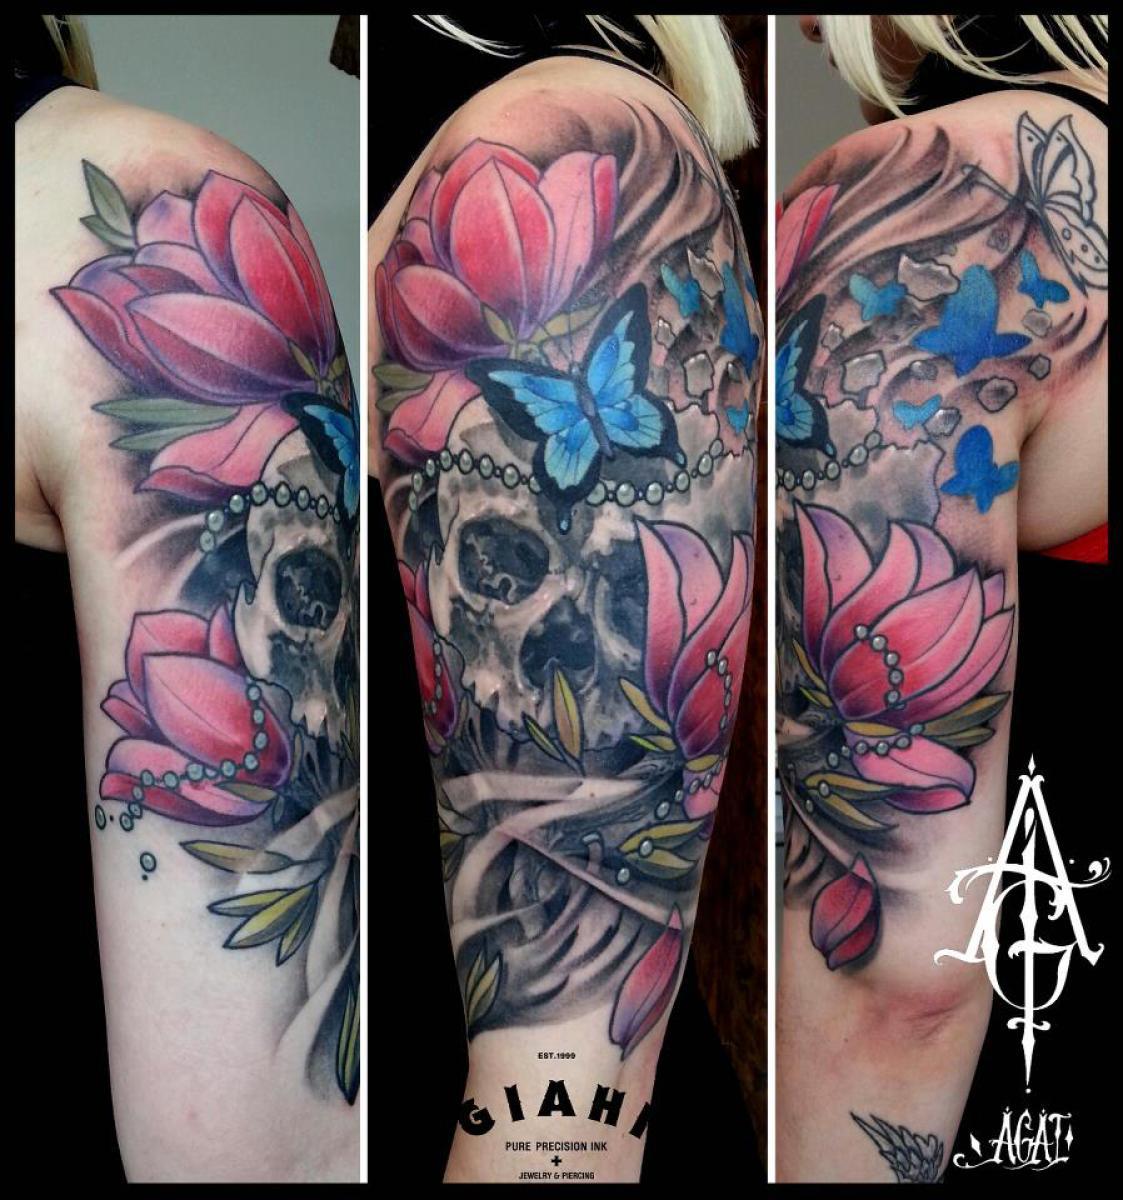 Cracked Butterfly Flowers Skull tattoo by Agat Artemji